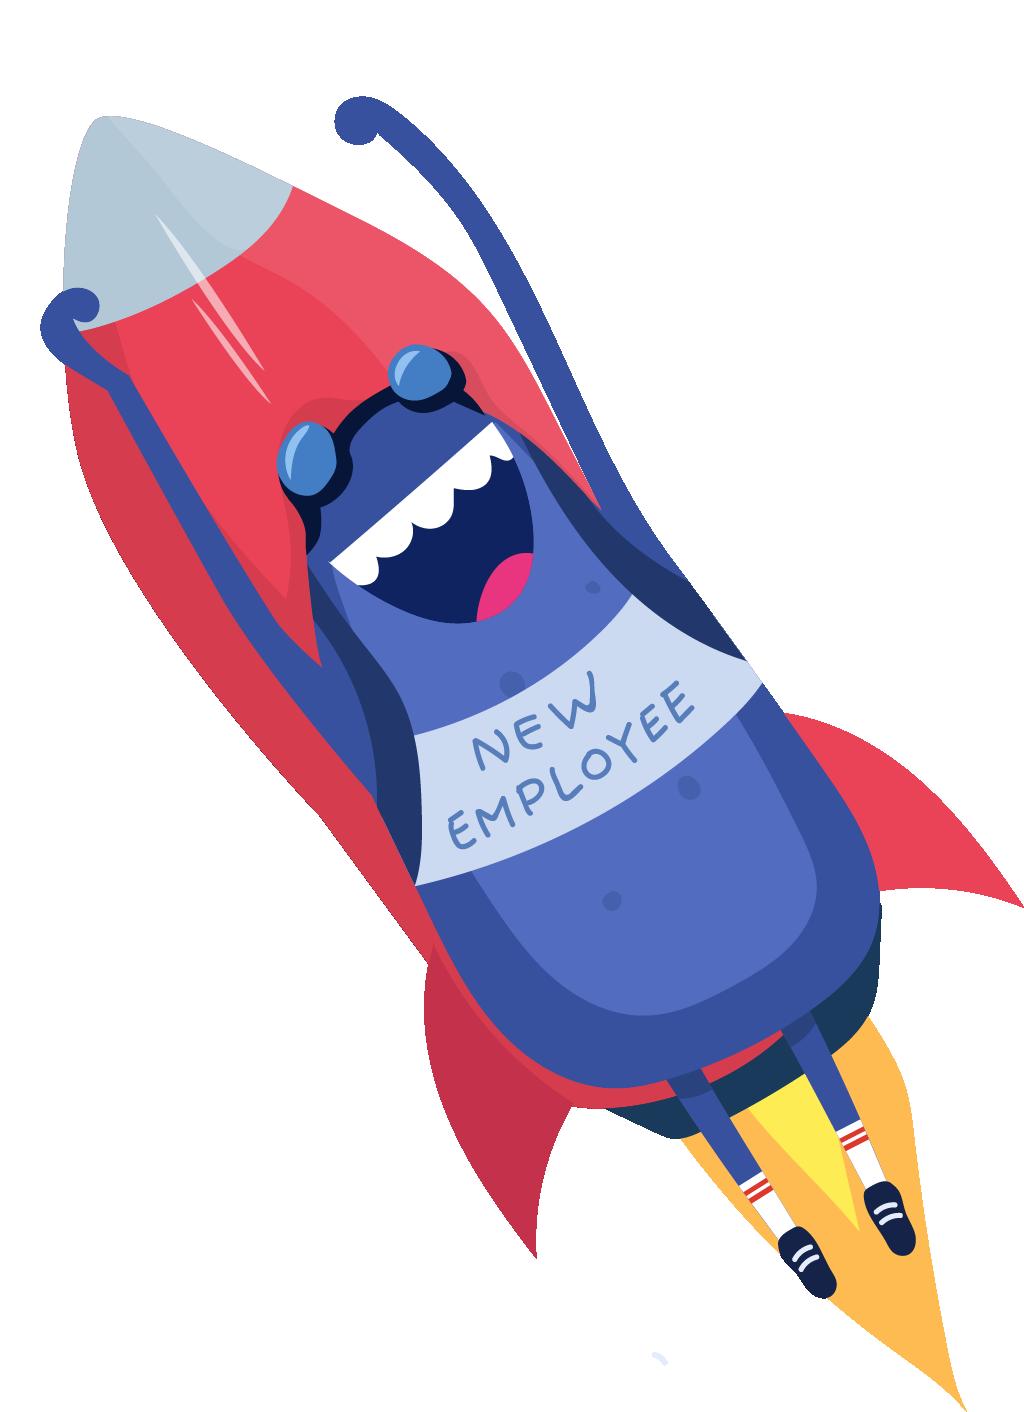 Bertie rocket wearing New Employee vest